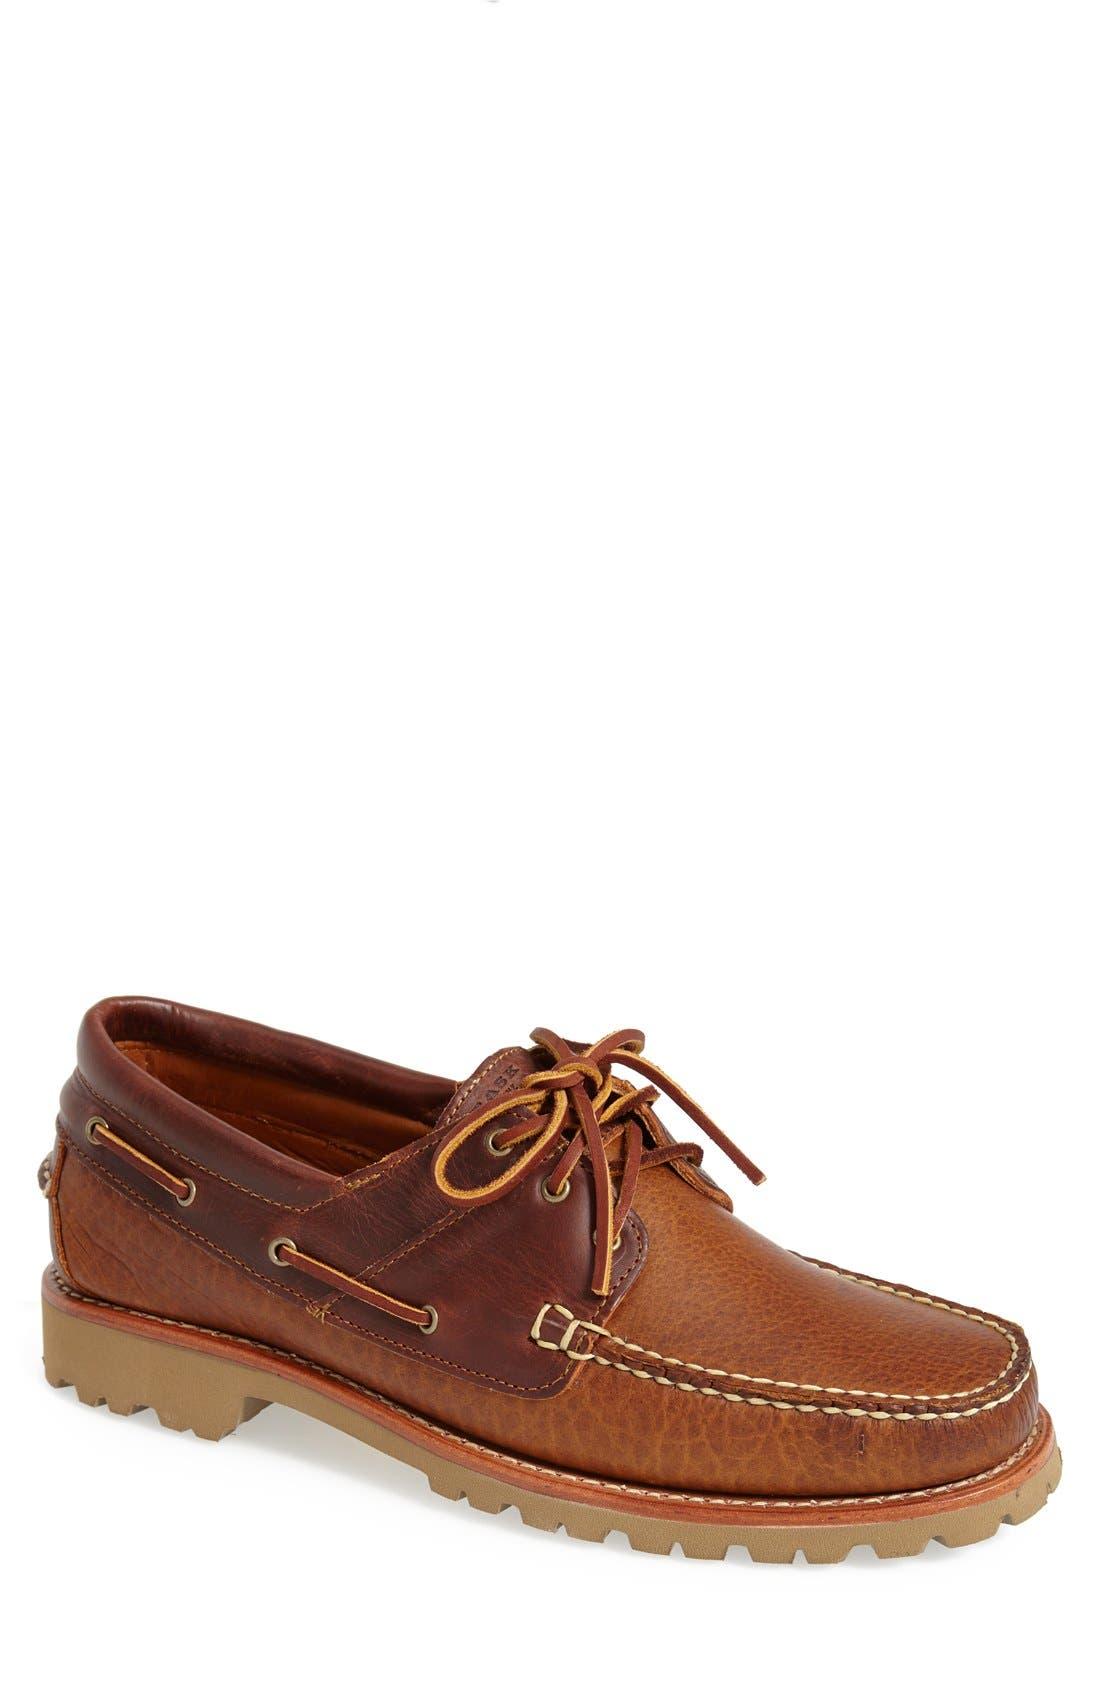 'Custer' Boat Shoe,                         Main,                         color,